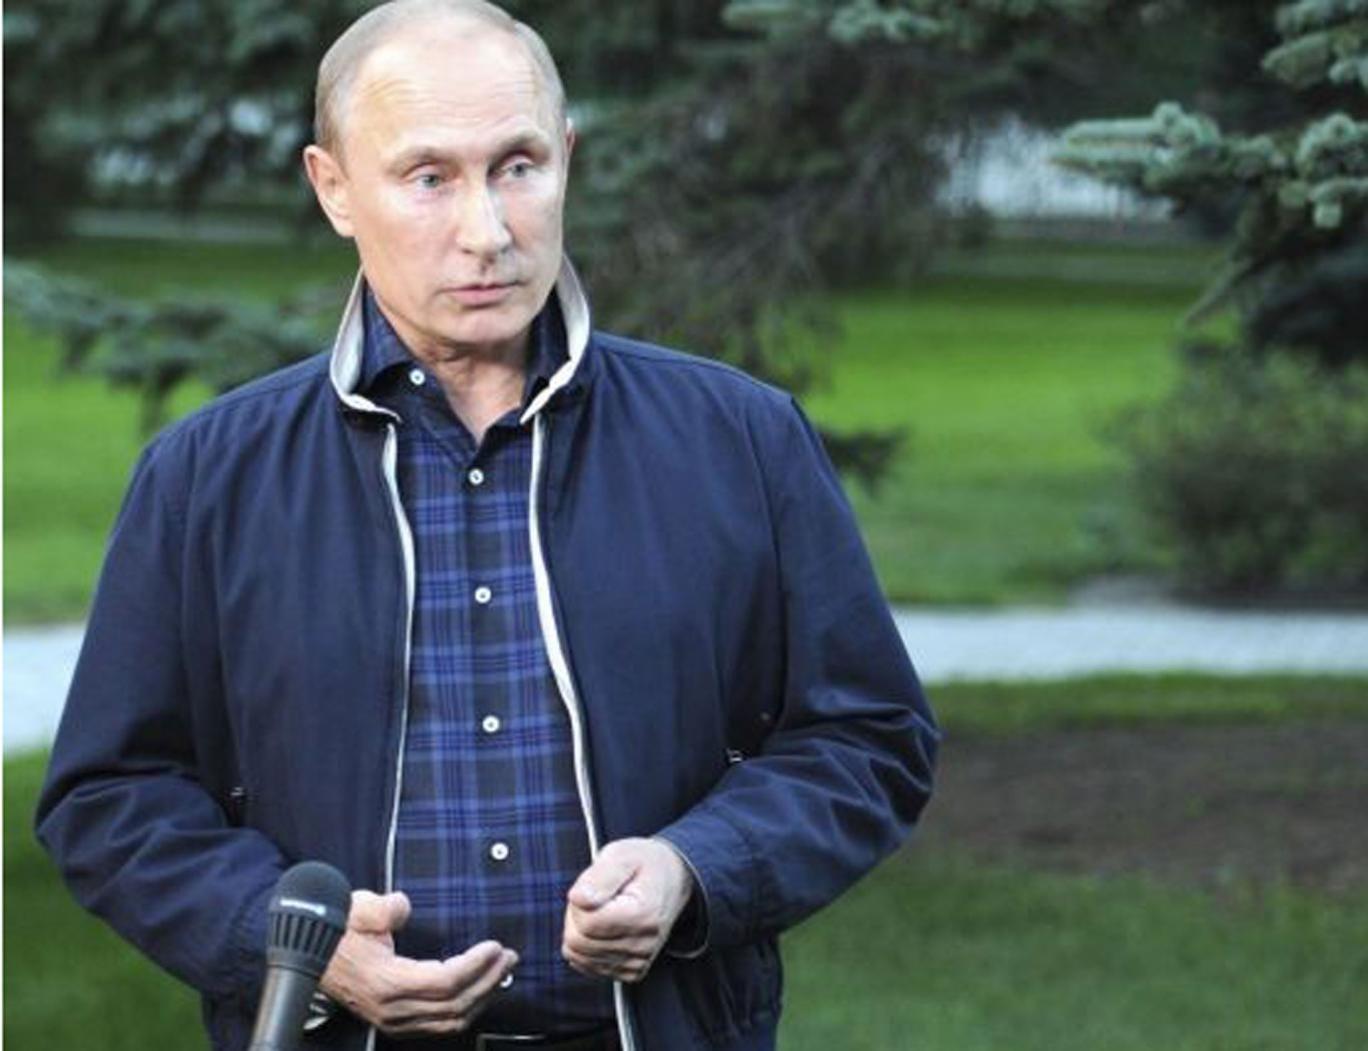 Russia's President Vladimir Putin talks to journalists in the far eastern city of Vladivostok